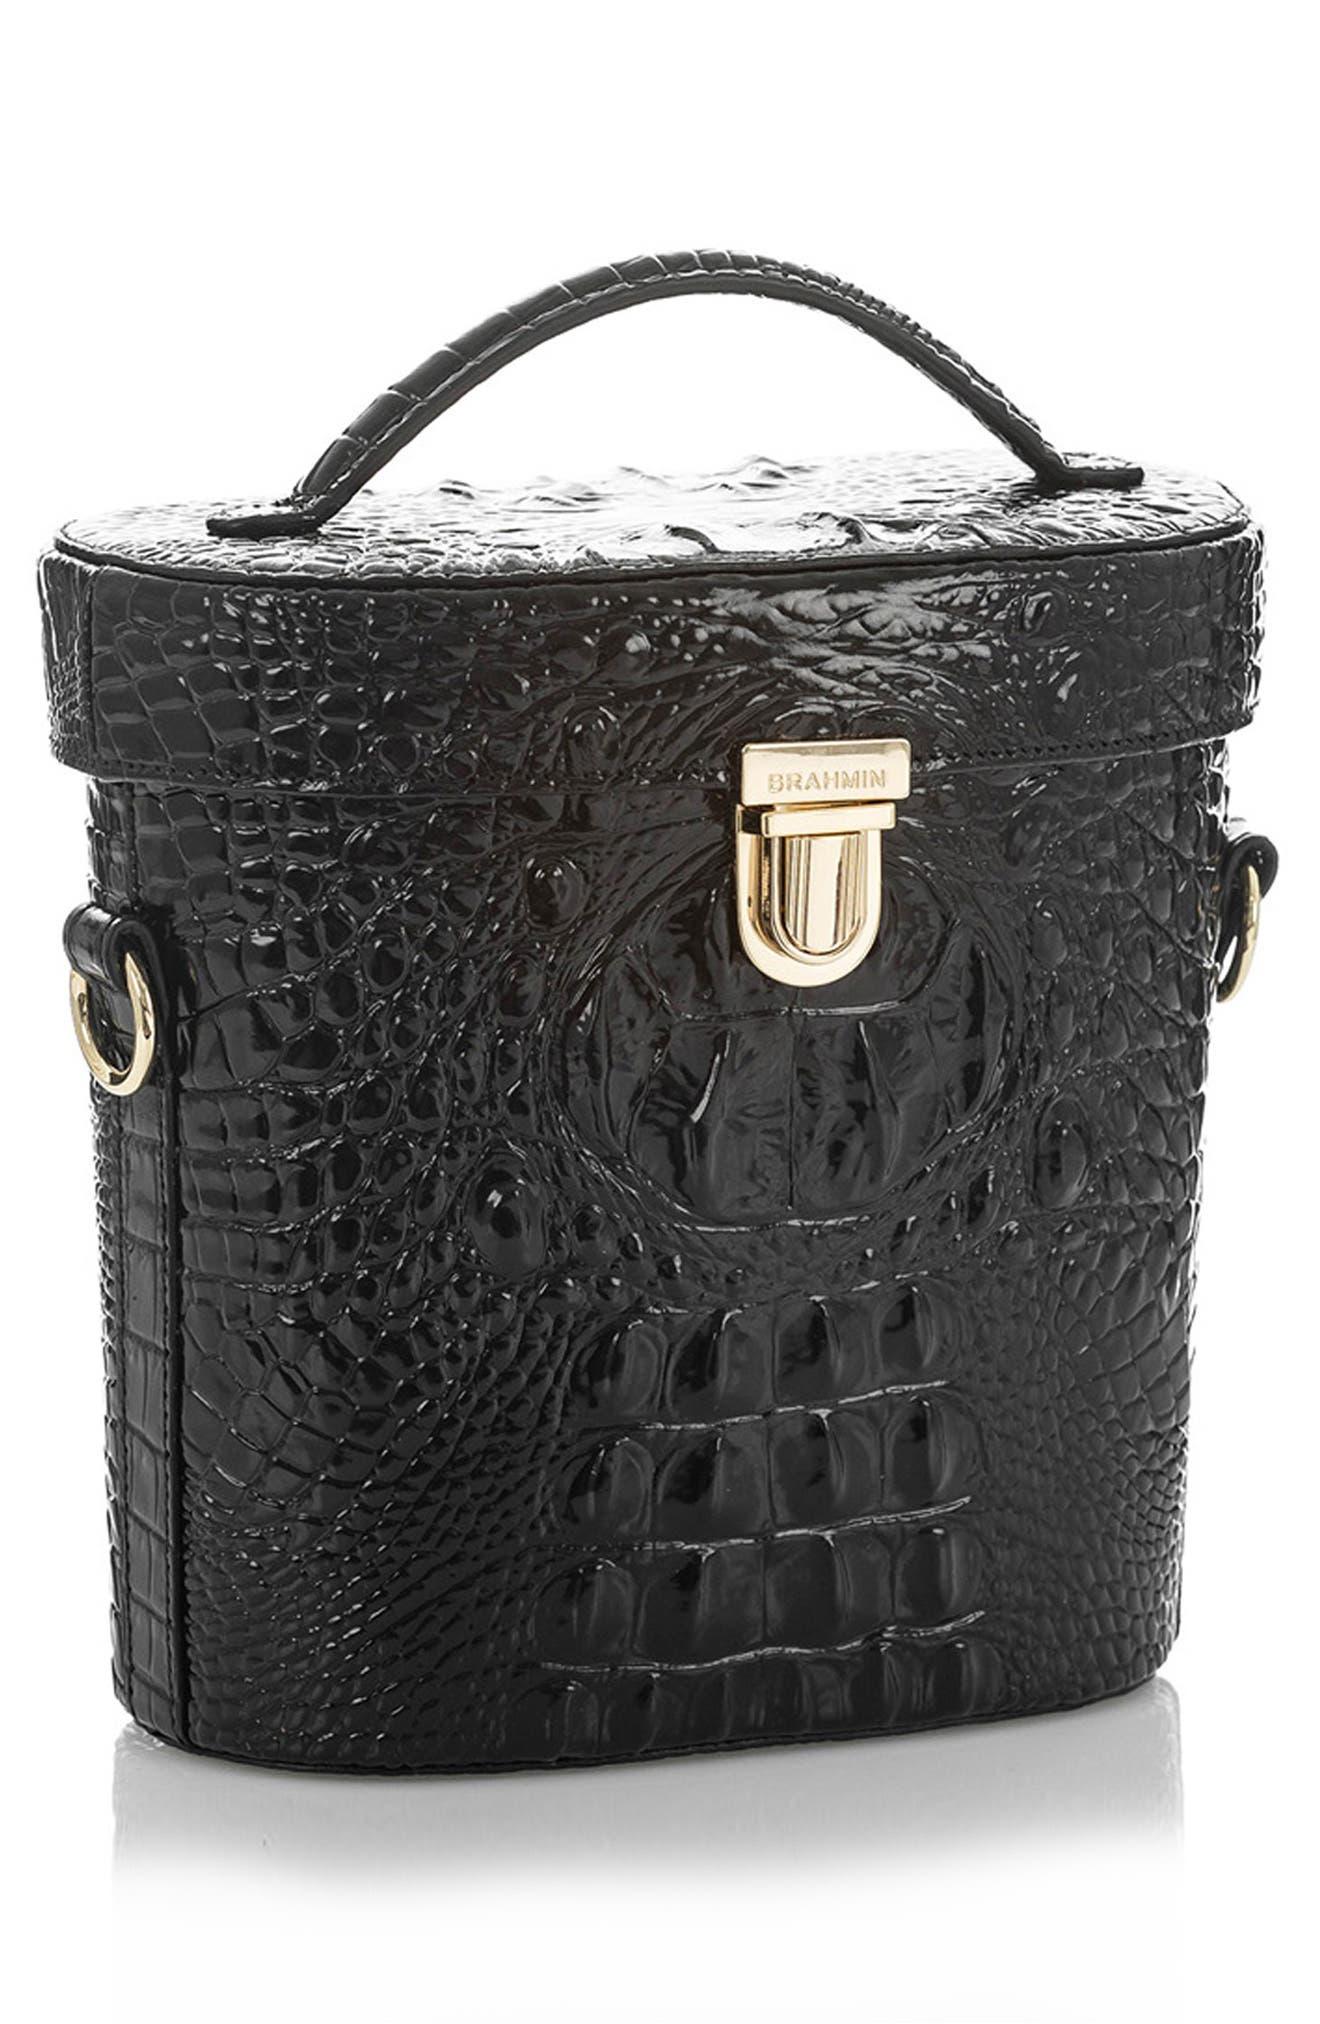 BRAHMIN, Pipp Croc Embossed Leather Top Handle Bag, Alternate thumbnail 4, color, BLACK MEMBOURNE